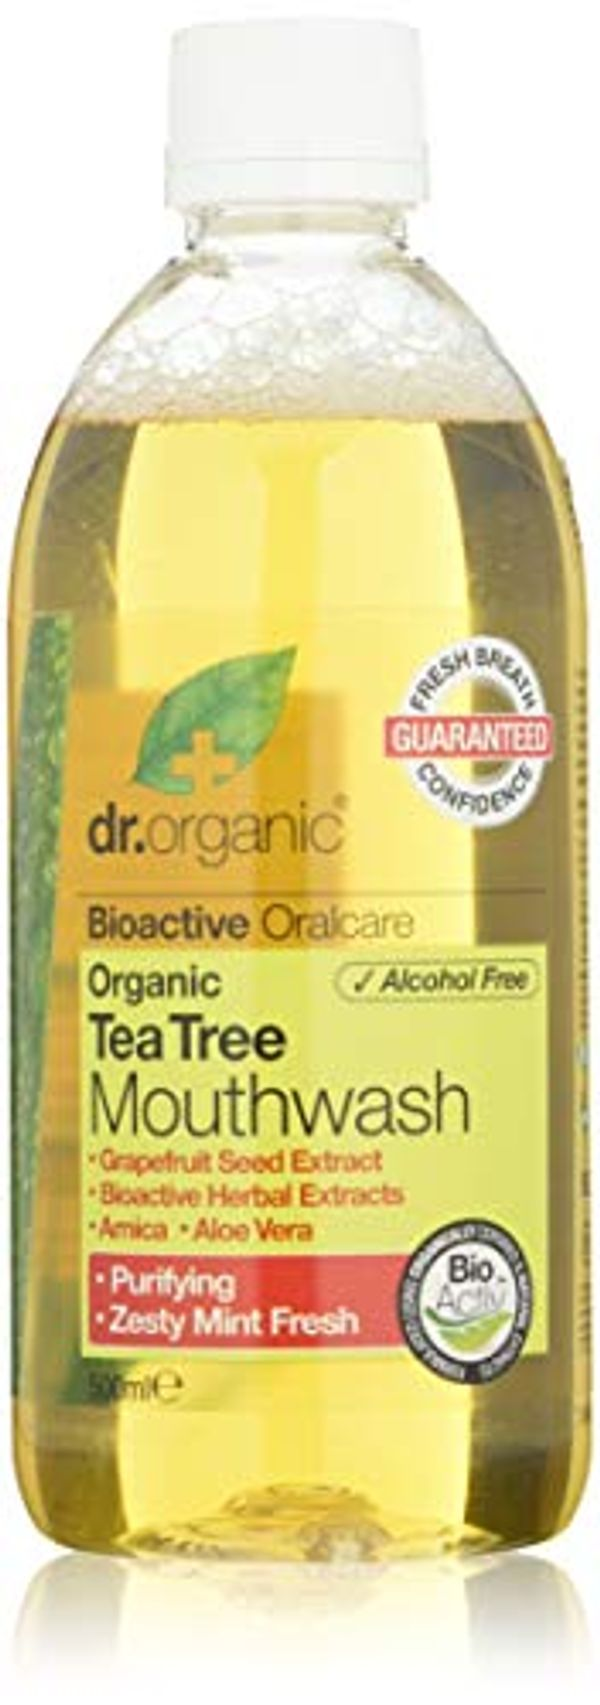 Dr. Organic Tea Tree Mouthwash, Mint, 500 ml